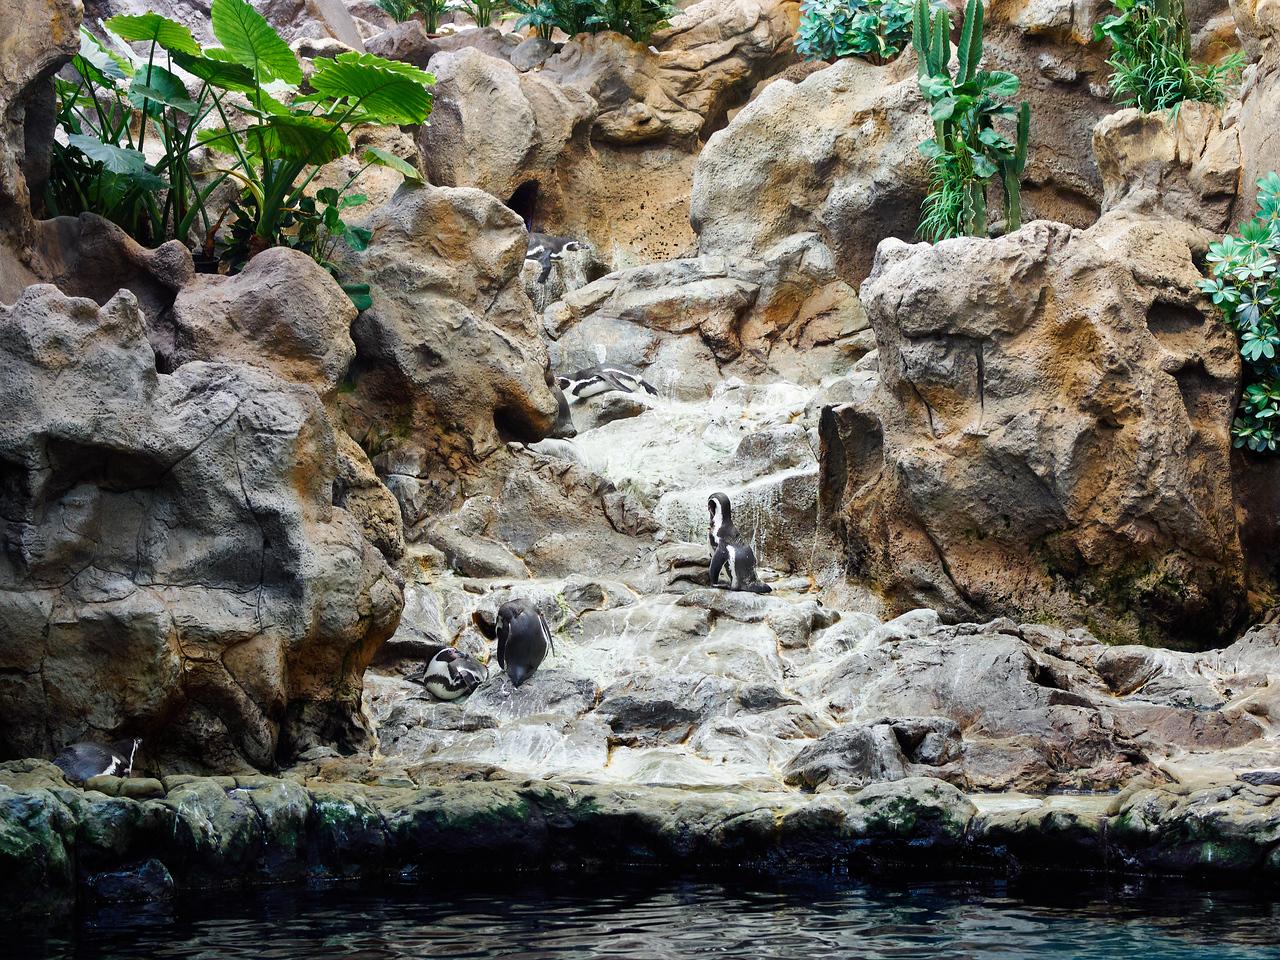 Humbold penguins